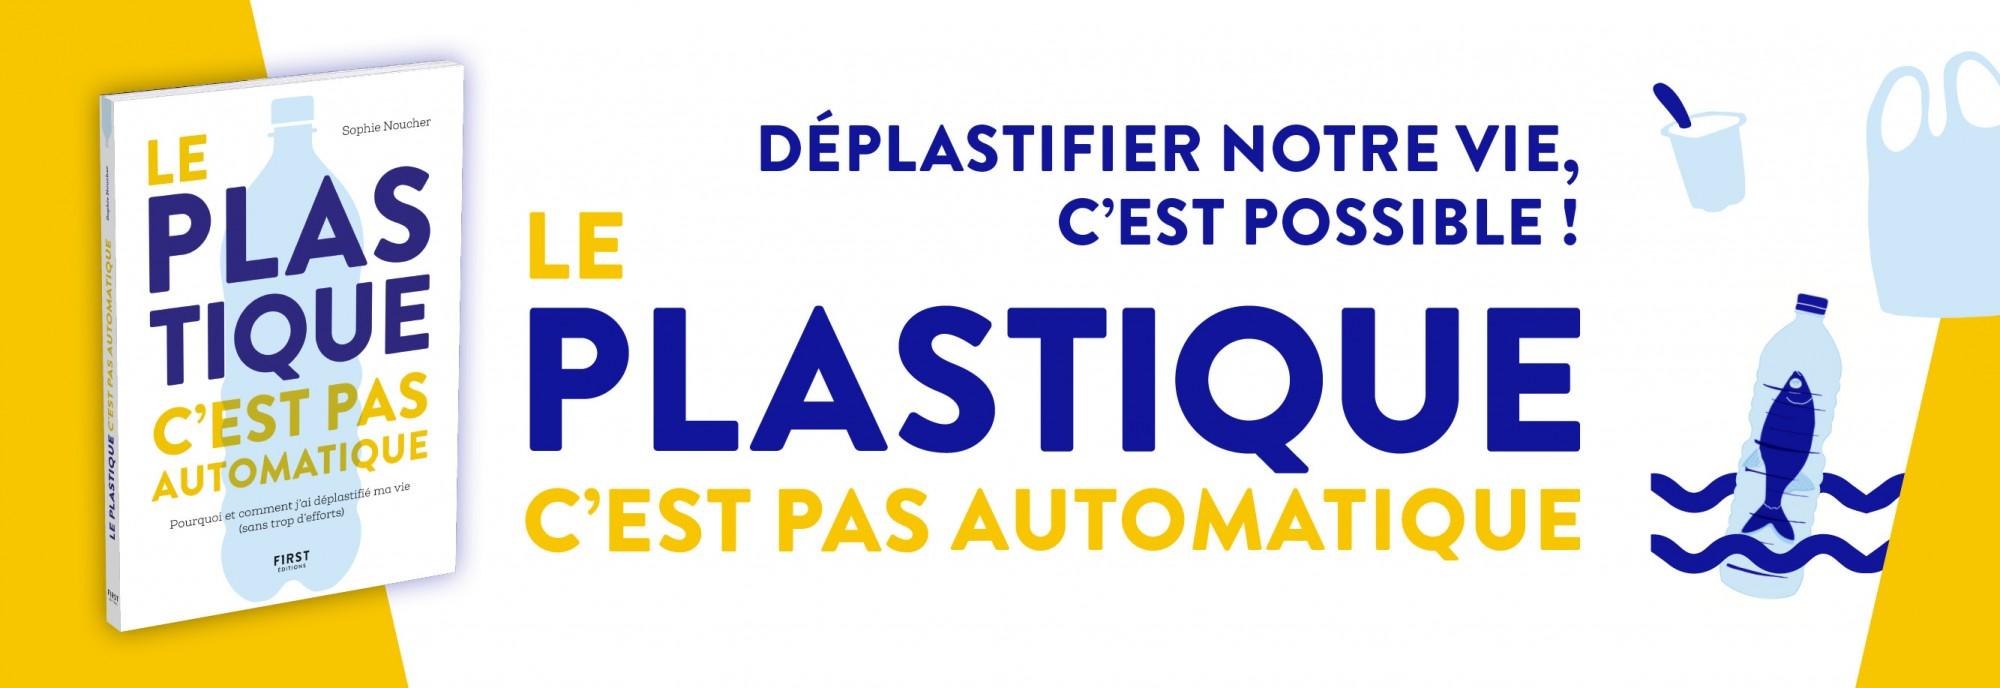 3057_1_Lisez_SliderM_PlastiquePasAutomatique.jpg